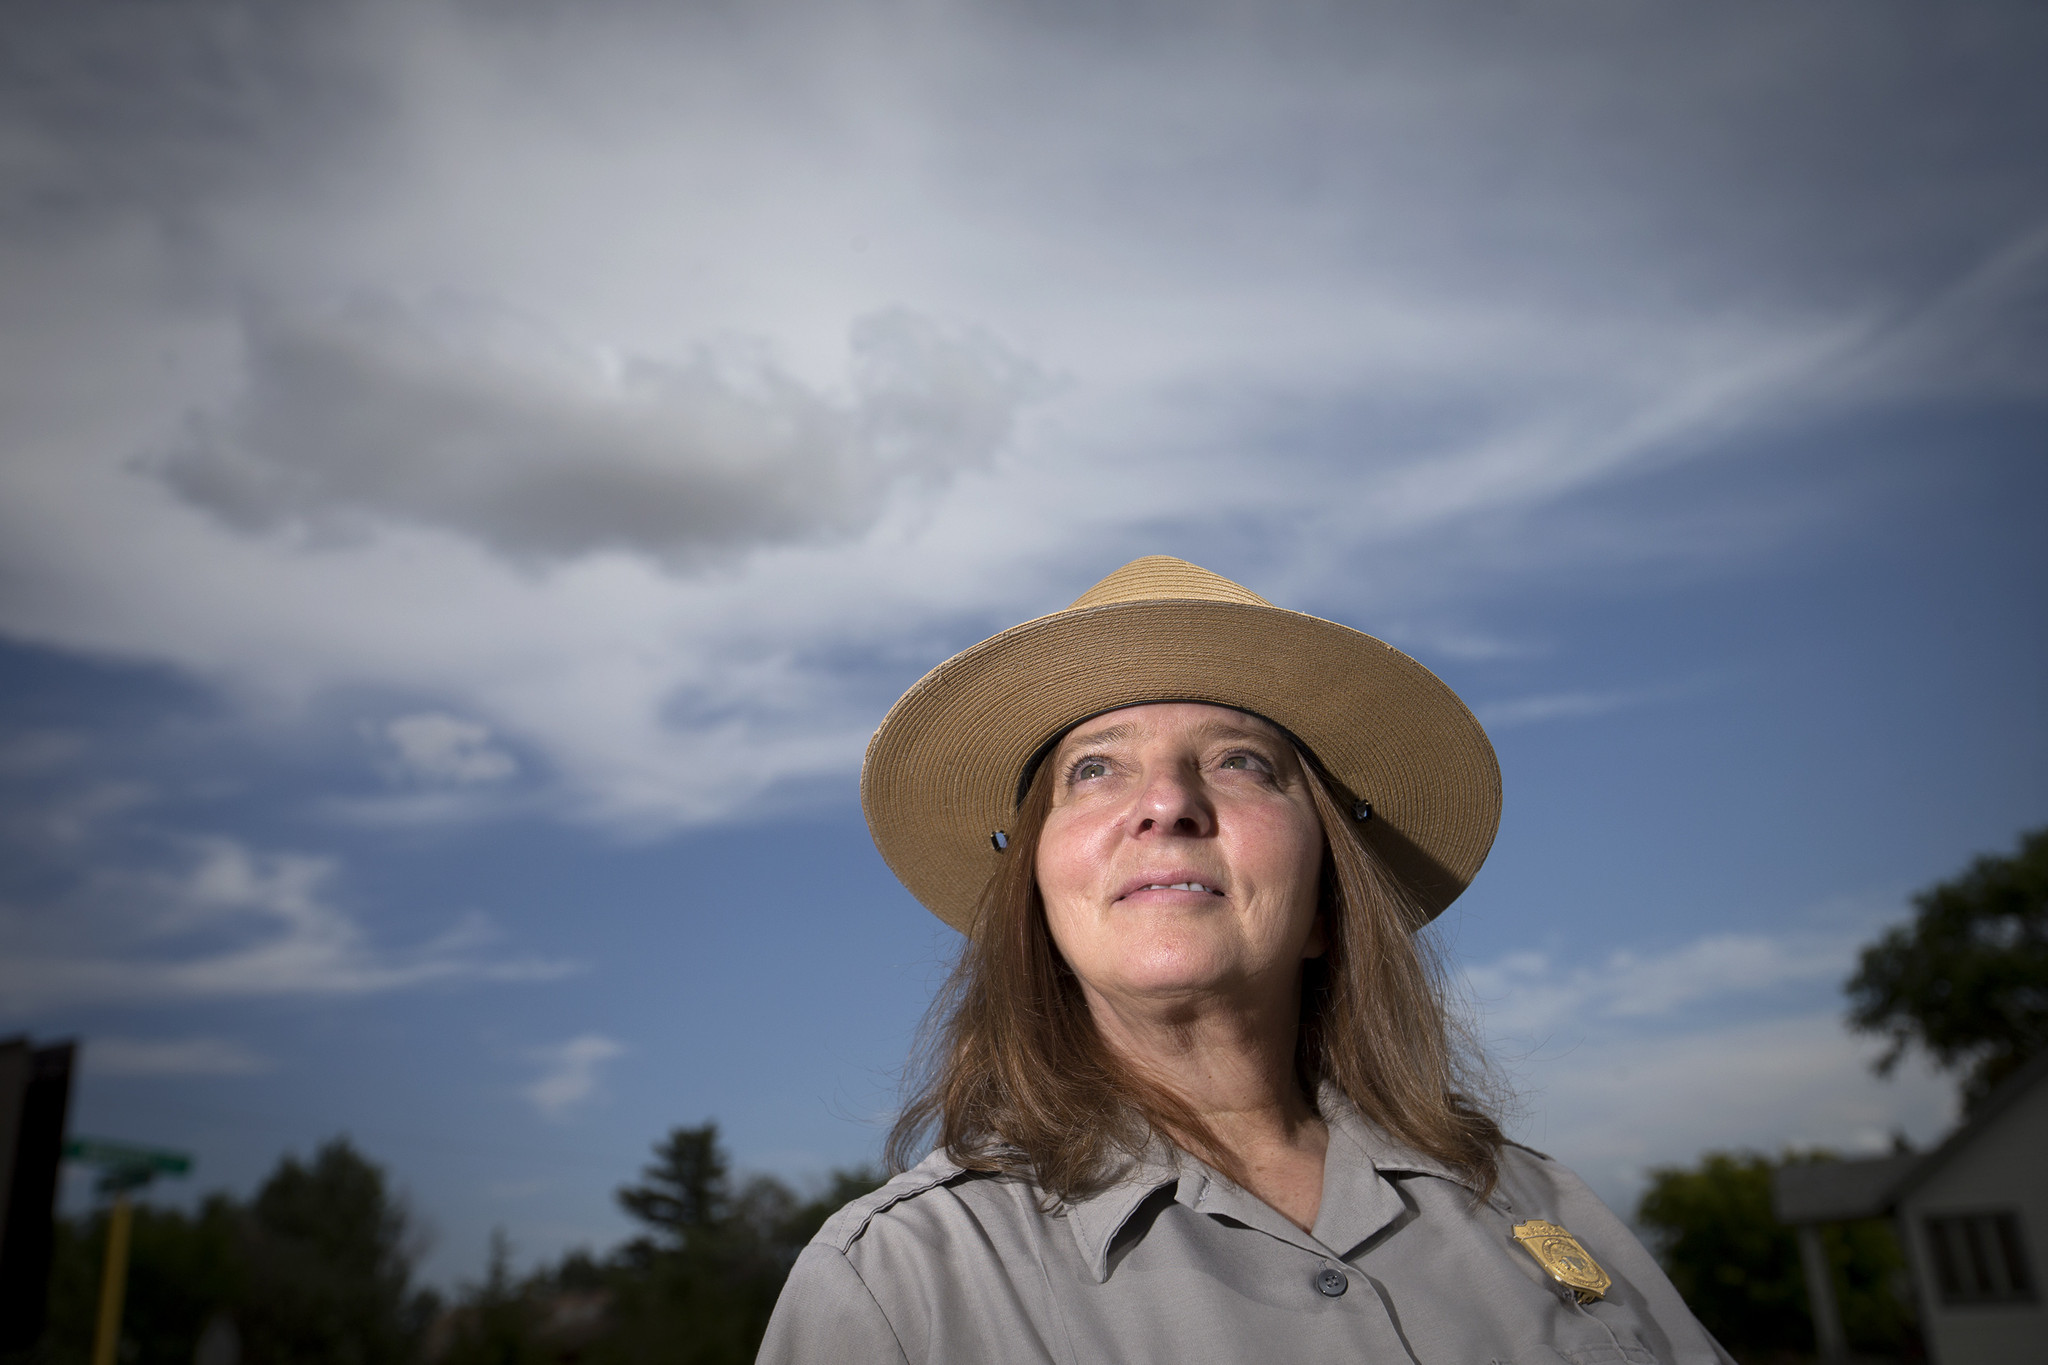 Alexa Roberts is the superintendent at Sand Creek Massacre National Historic Site.